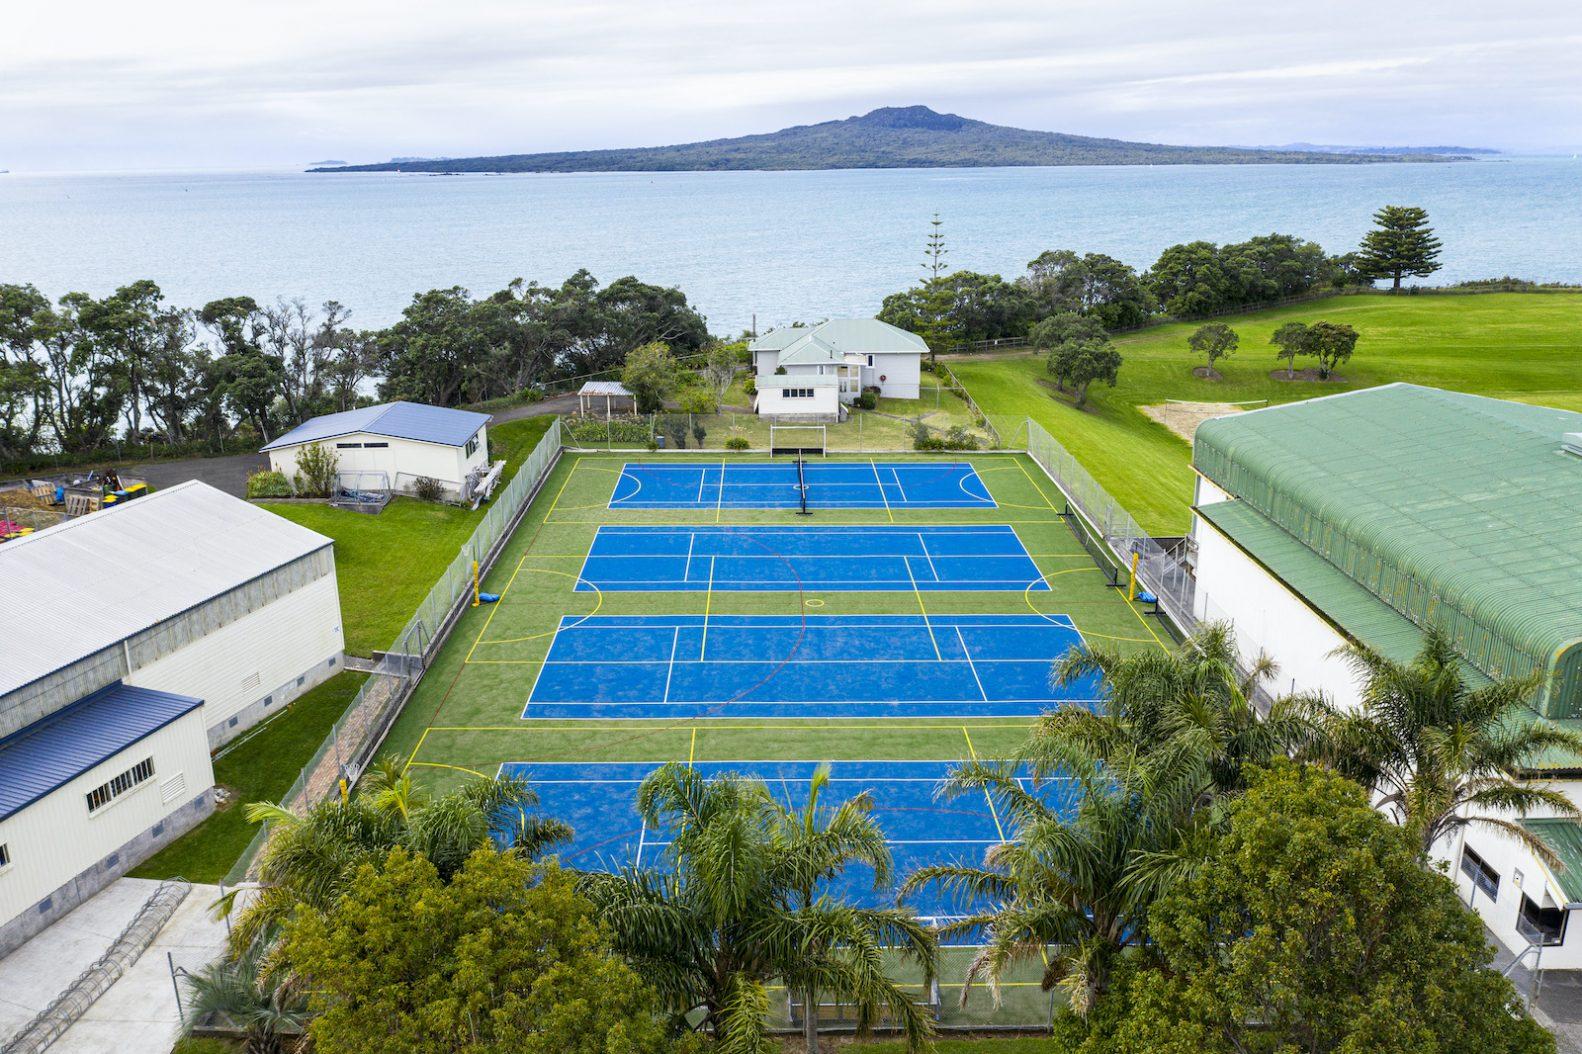 Takapuna Grammar School courts